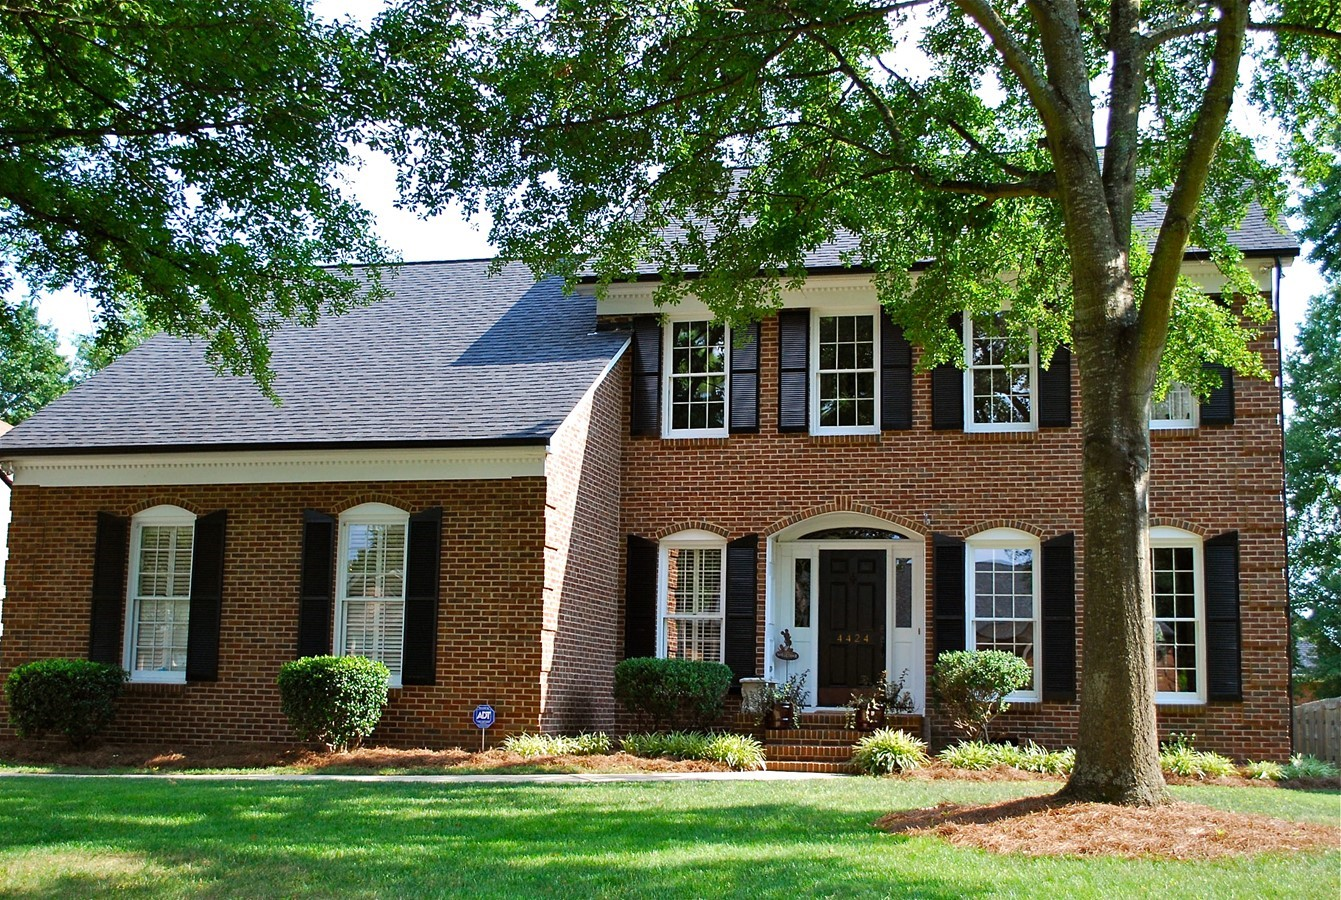 5611 sheldon road - Stunning Renovated Home In Carmel Southpark Area 4424 Asherton Dr Charlotte Nc 28226